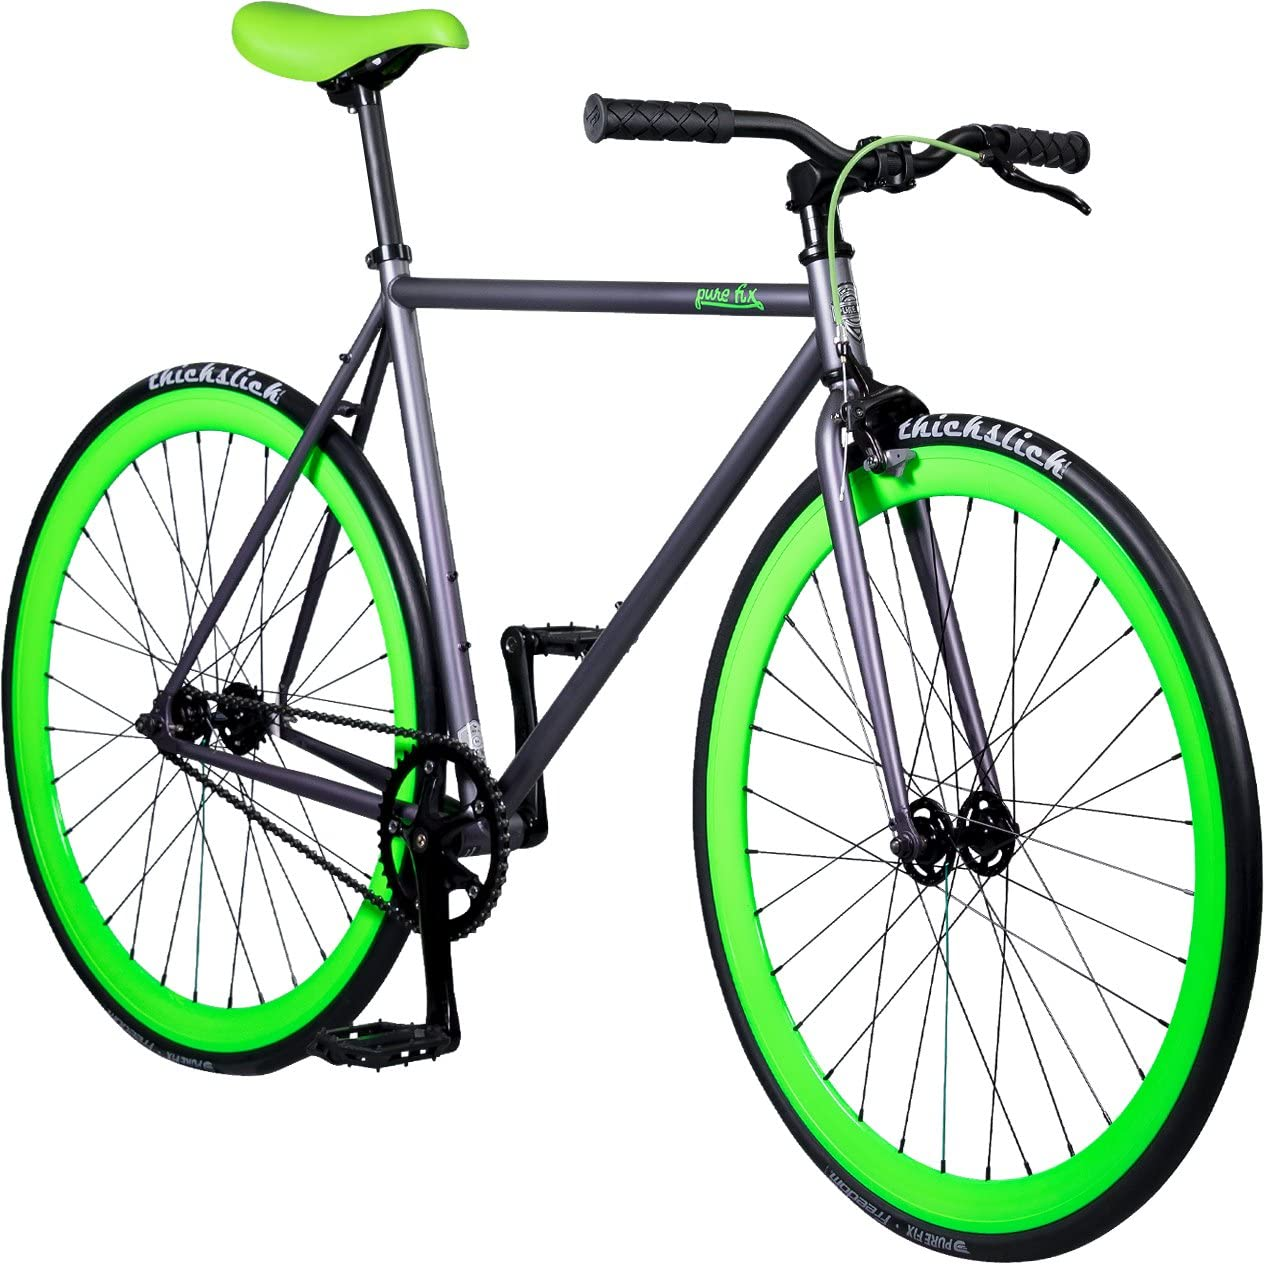 Pure-Fix-Glow-in-the-Dark-Fixed-Gear-Single-Speed-Fixie-Bike-1